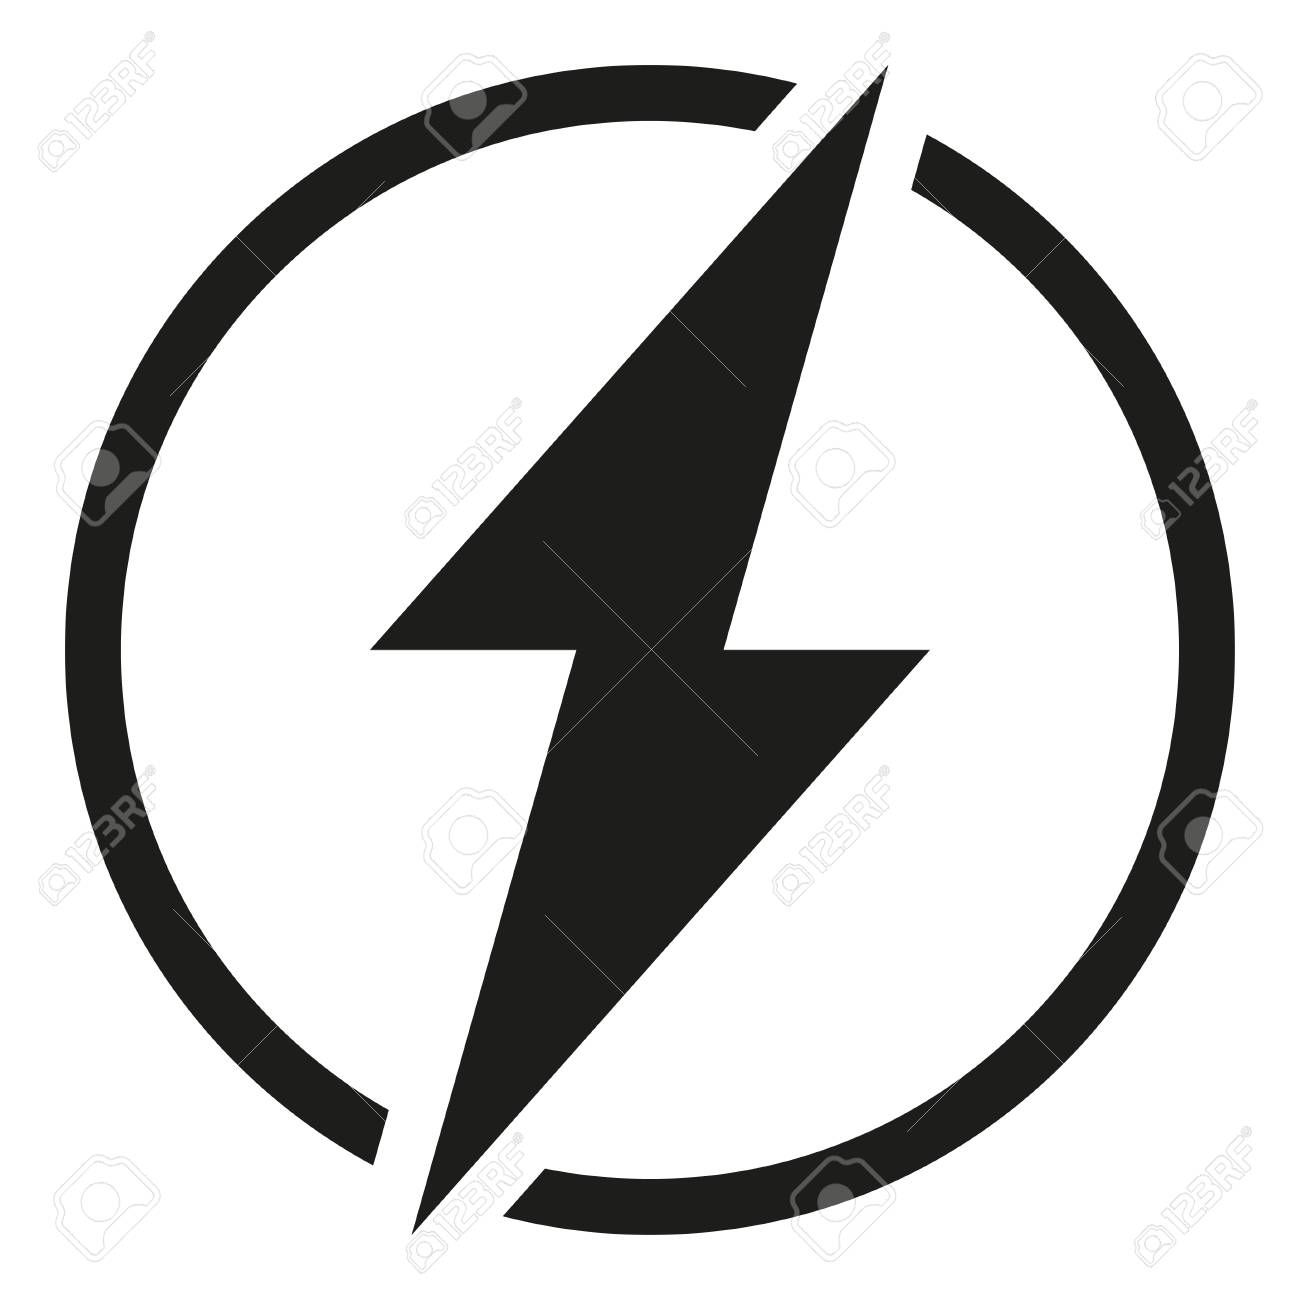 Black and white rounded lightning silhouette  Power energy symbol